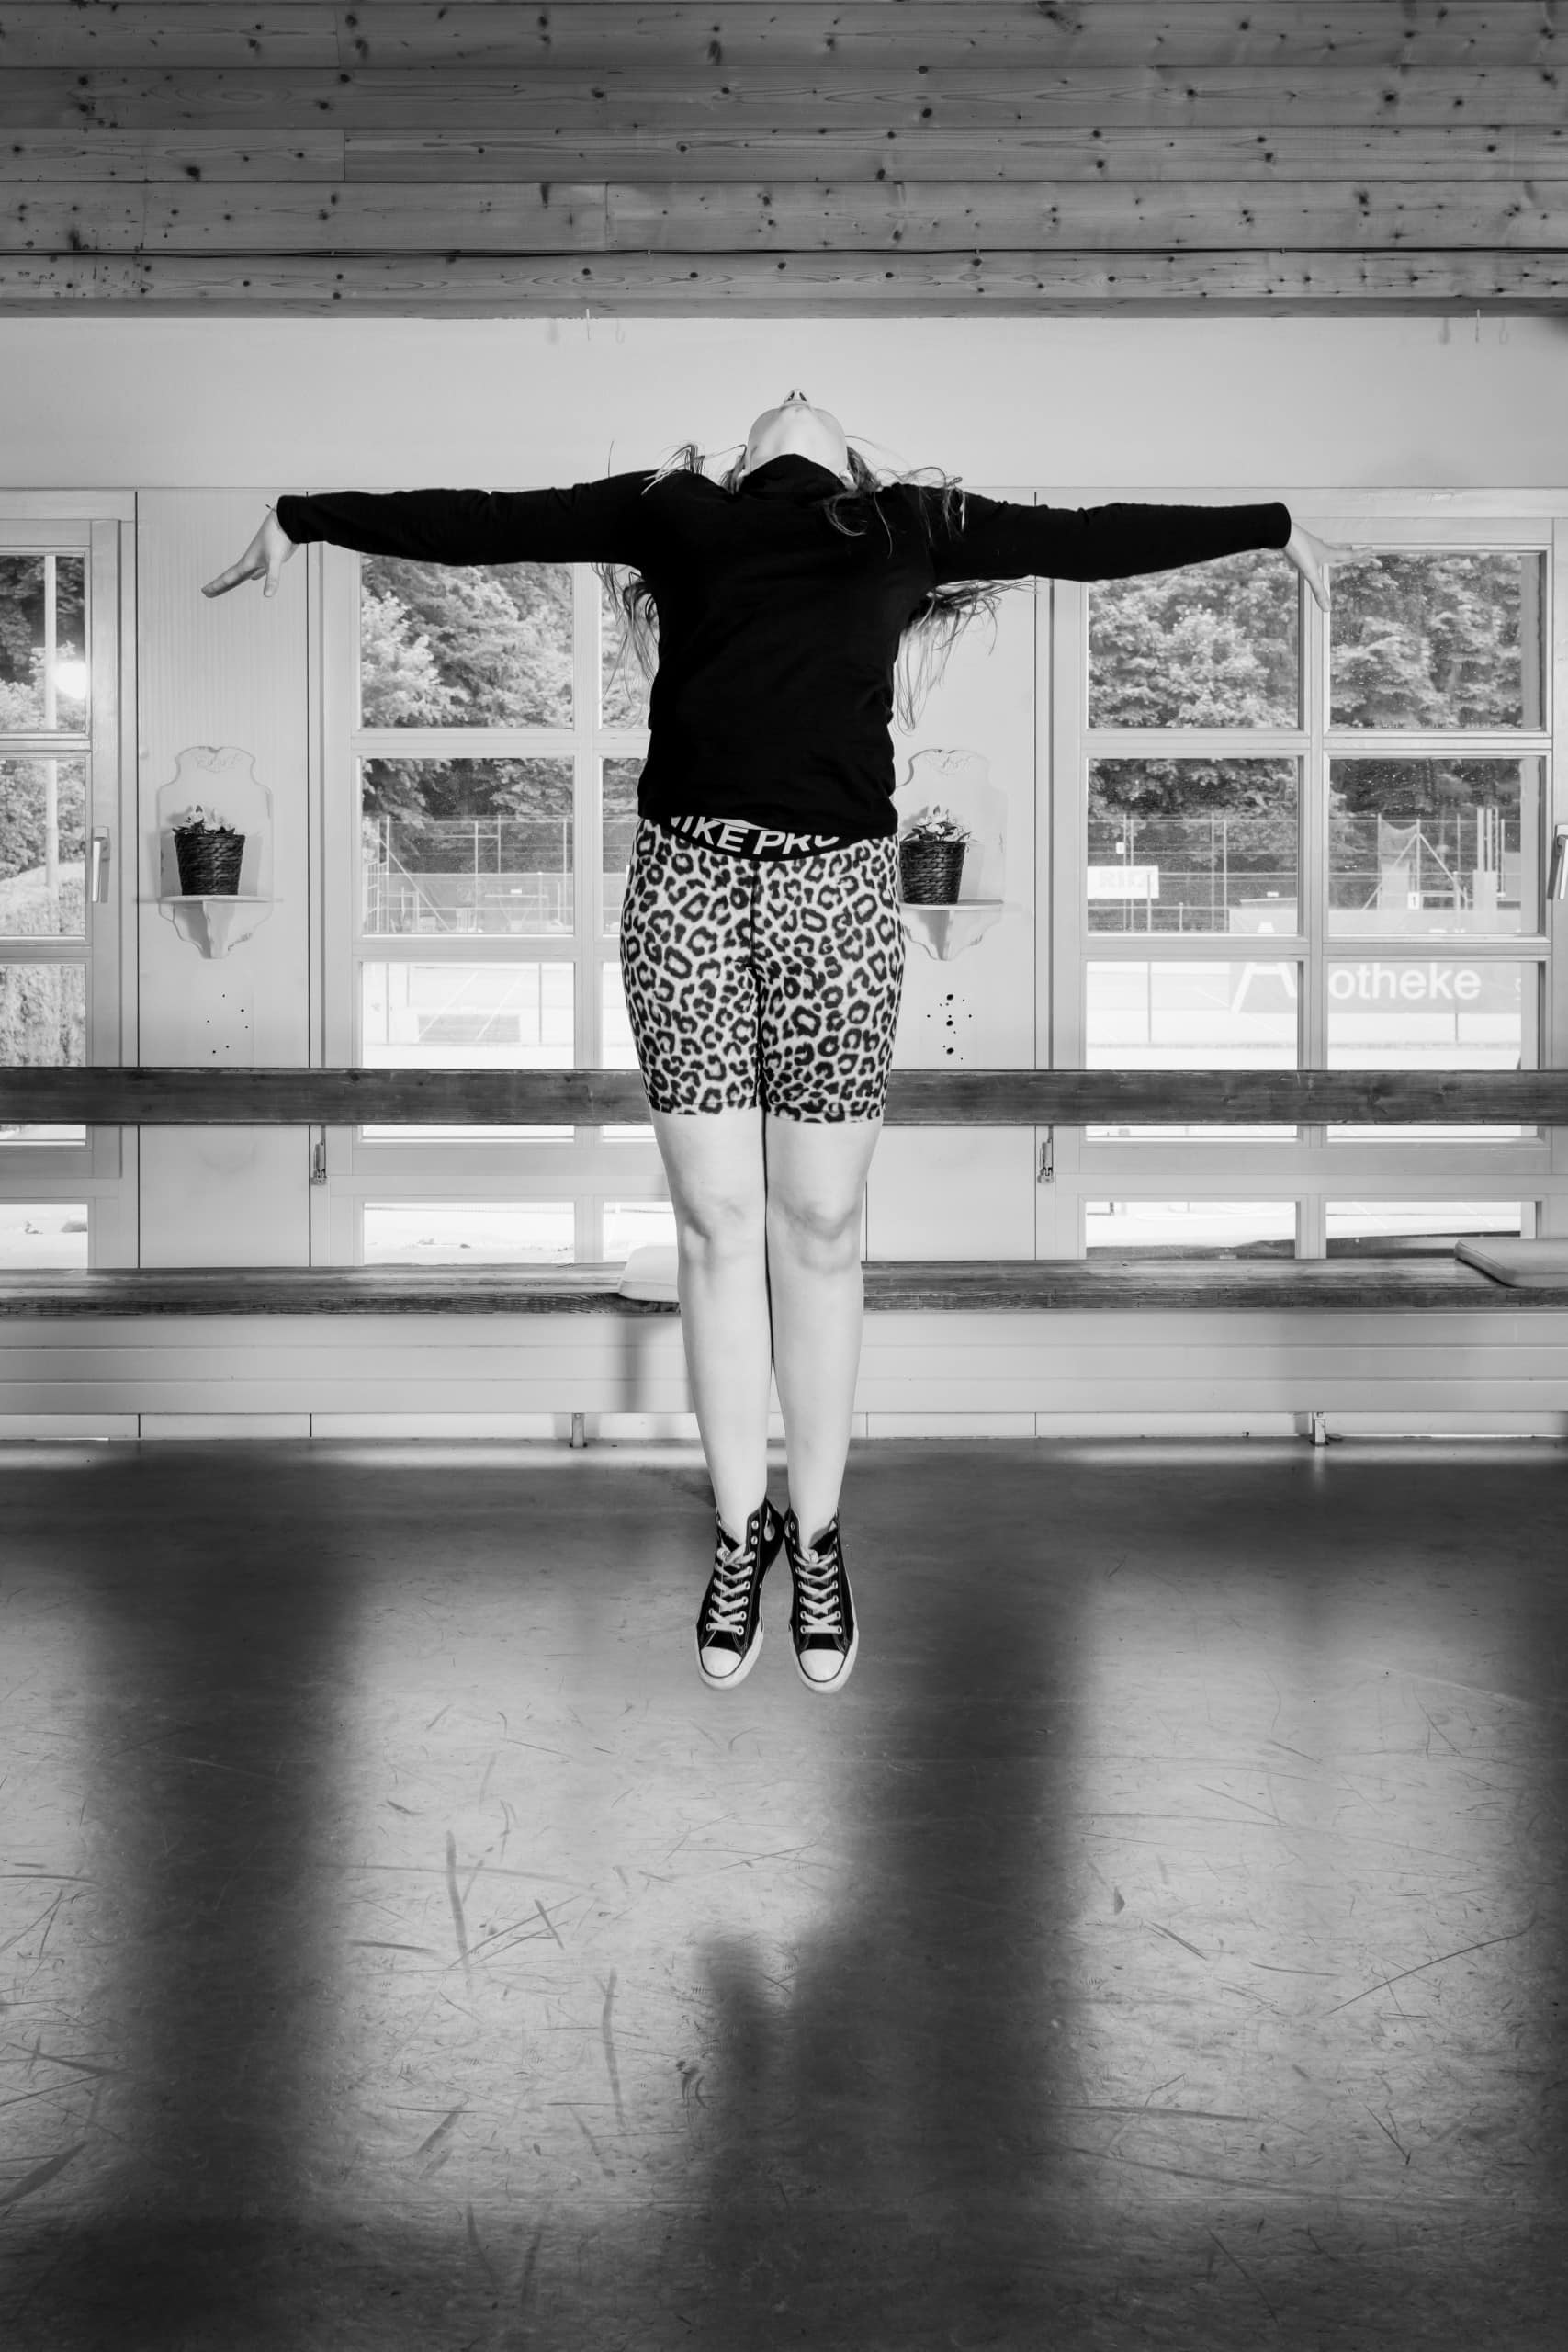 Tanzsshooting Sprung